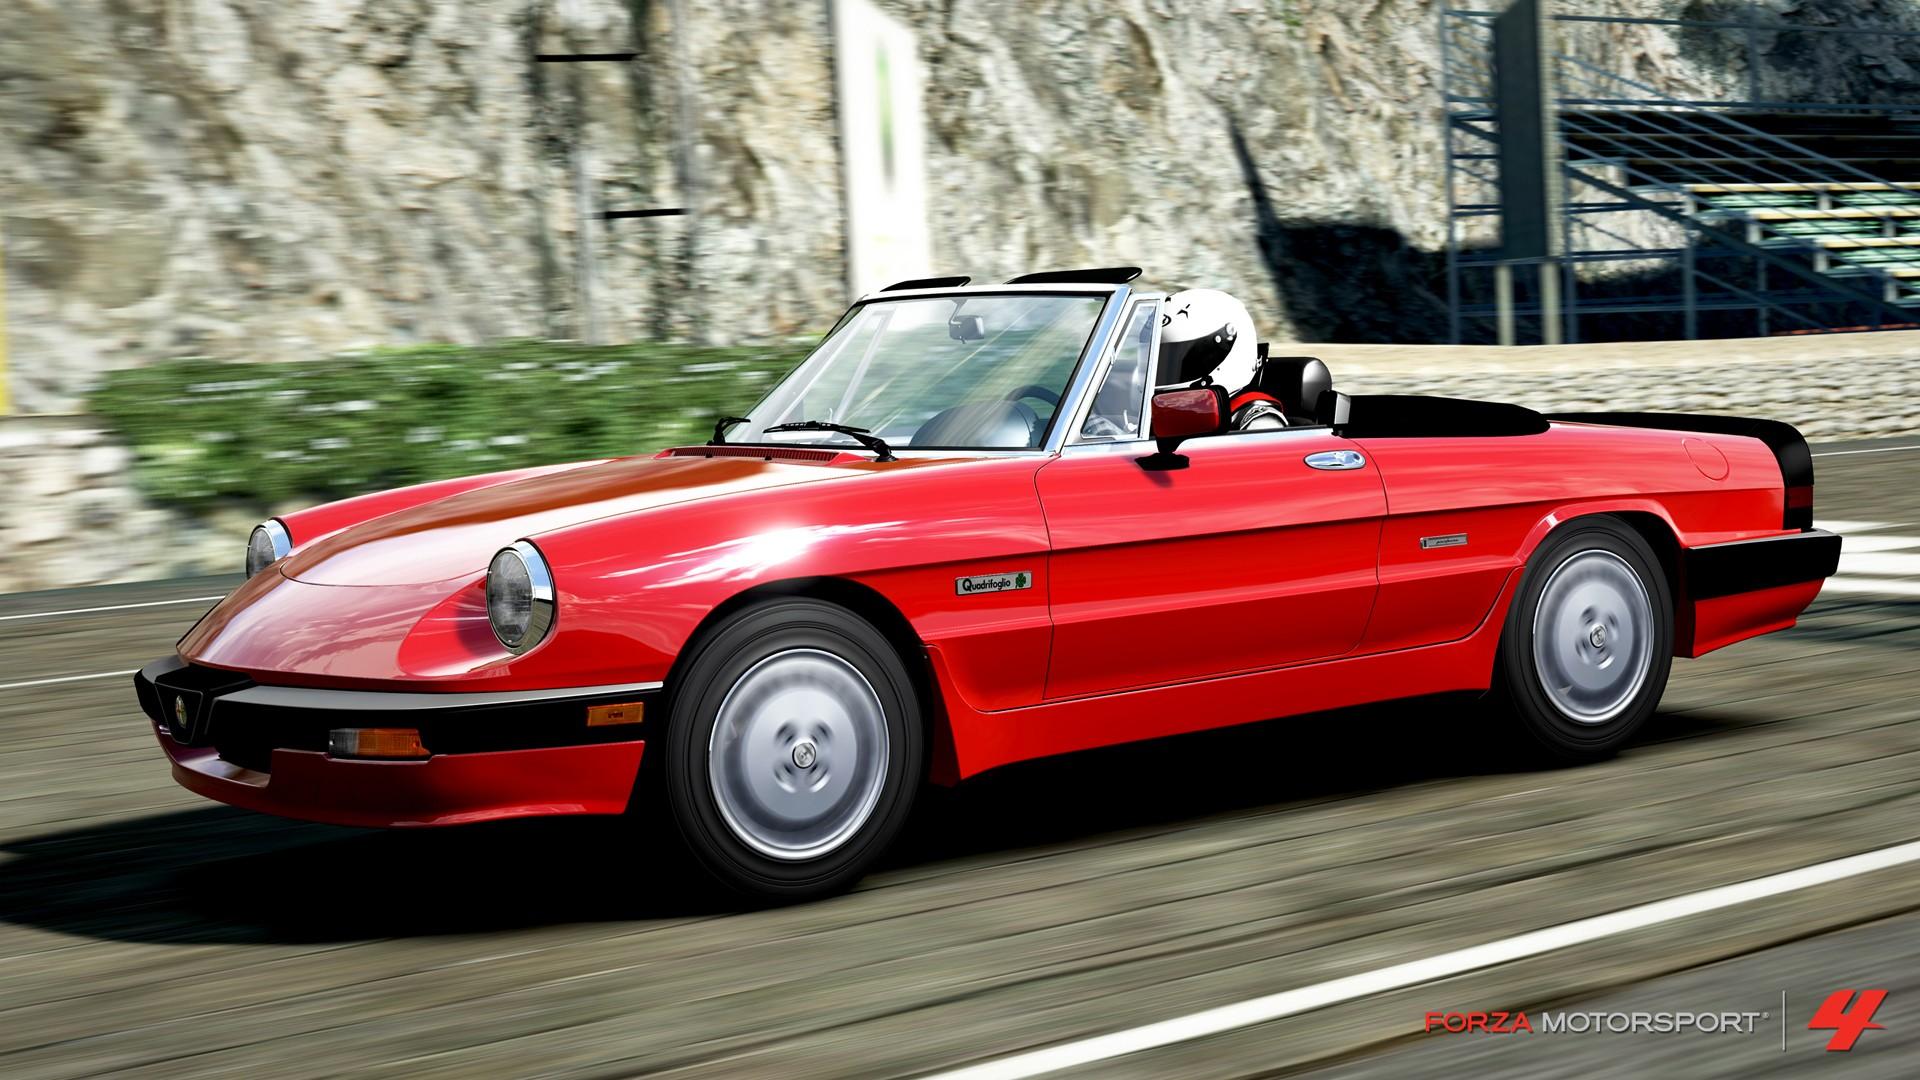 Wallpaper Video Games Sports Car Classic Car Convertible Forza